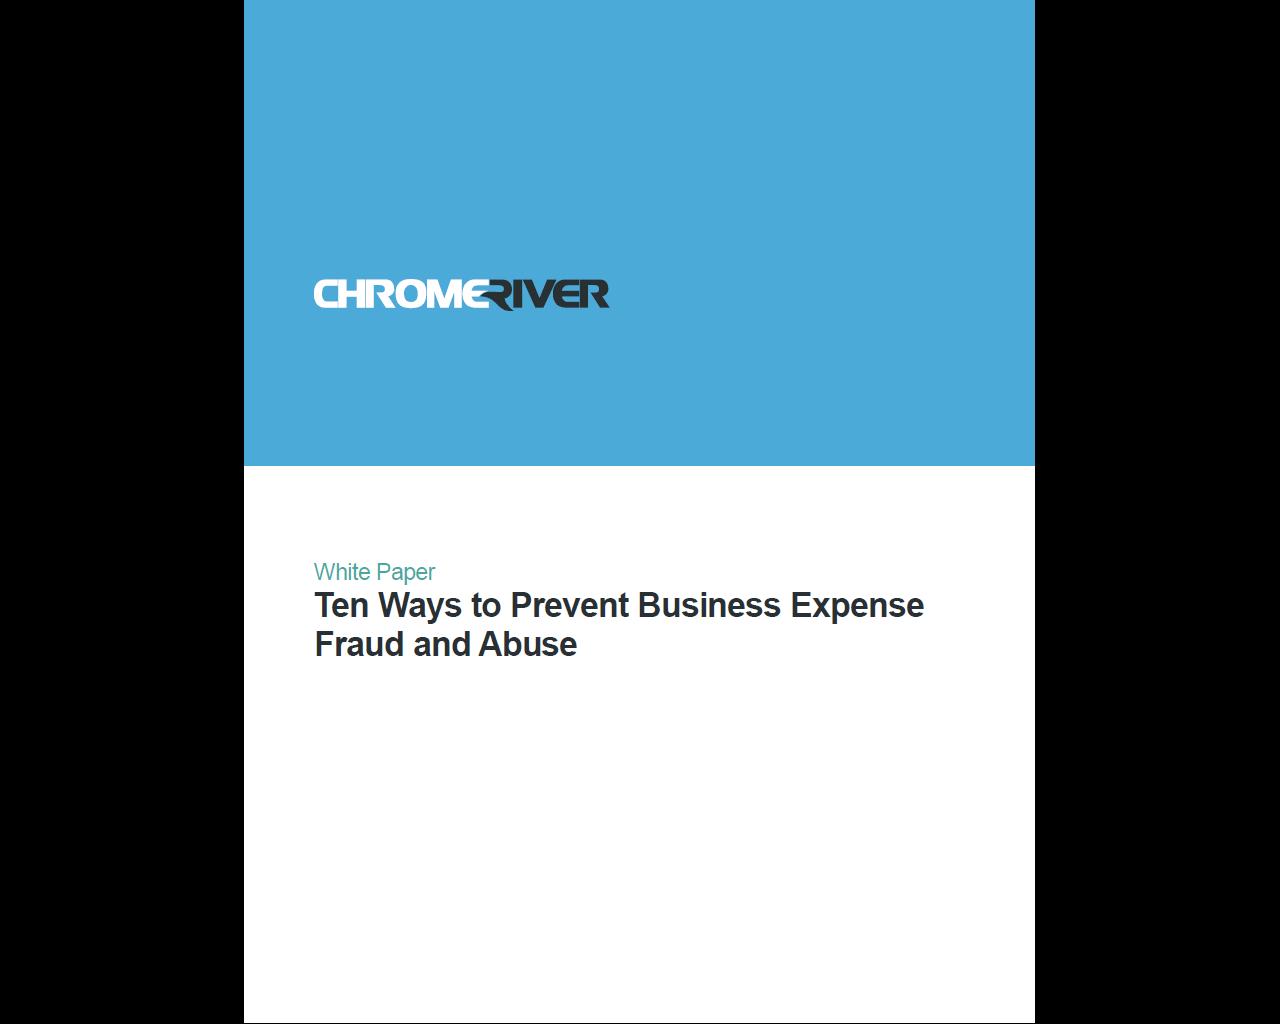 Chrome River - 10 Ways to Reduce Expense Fraud